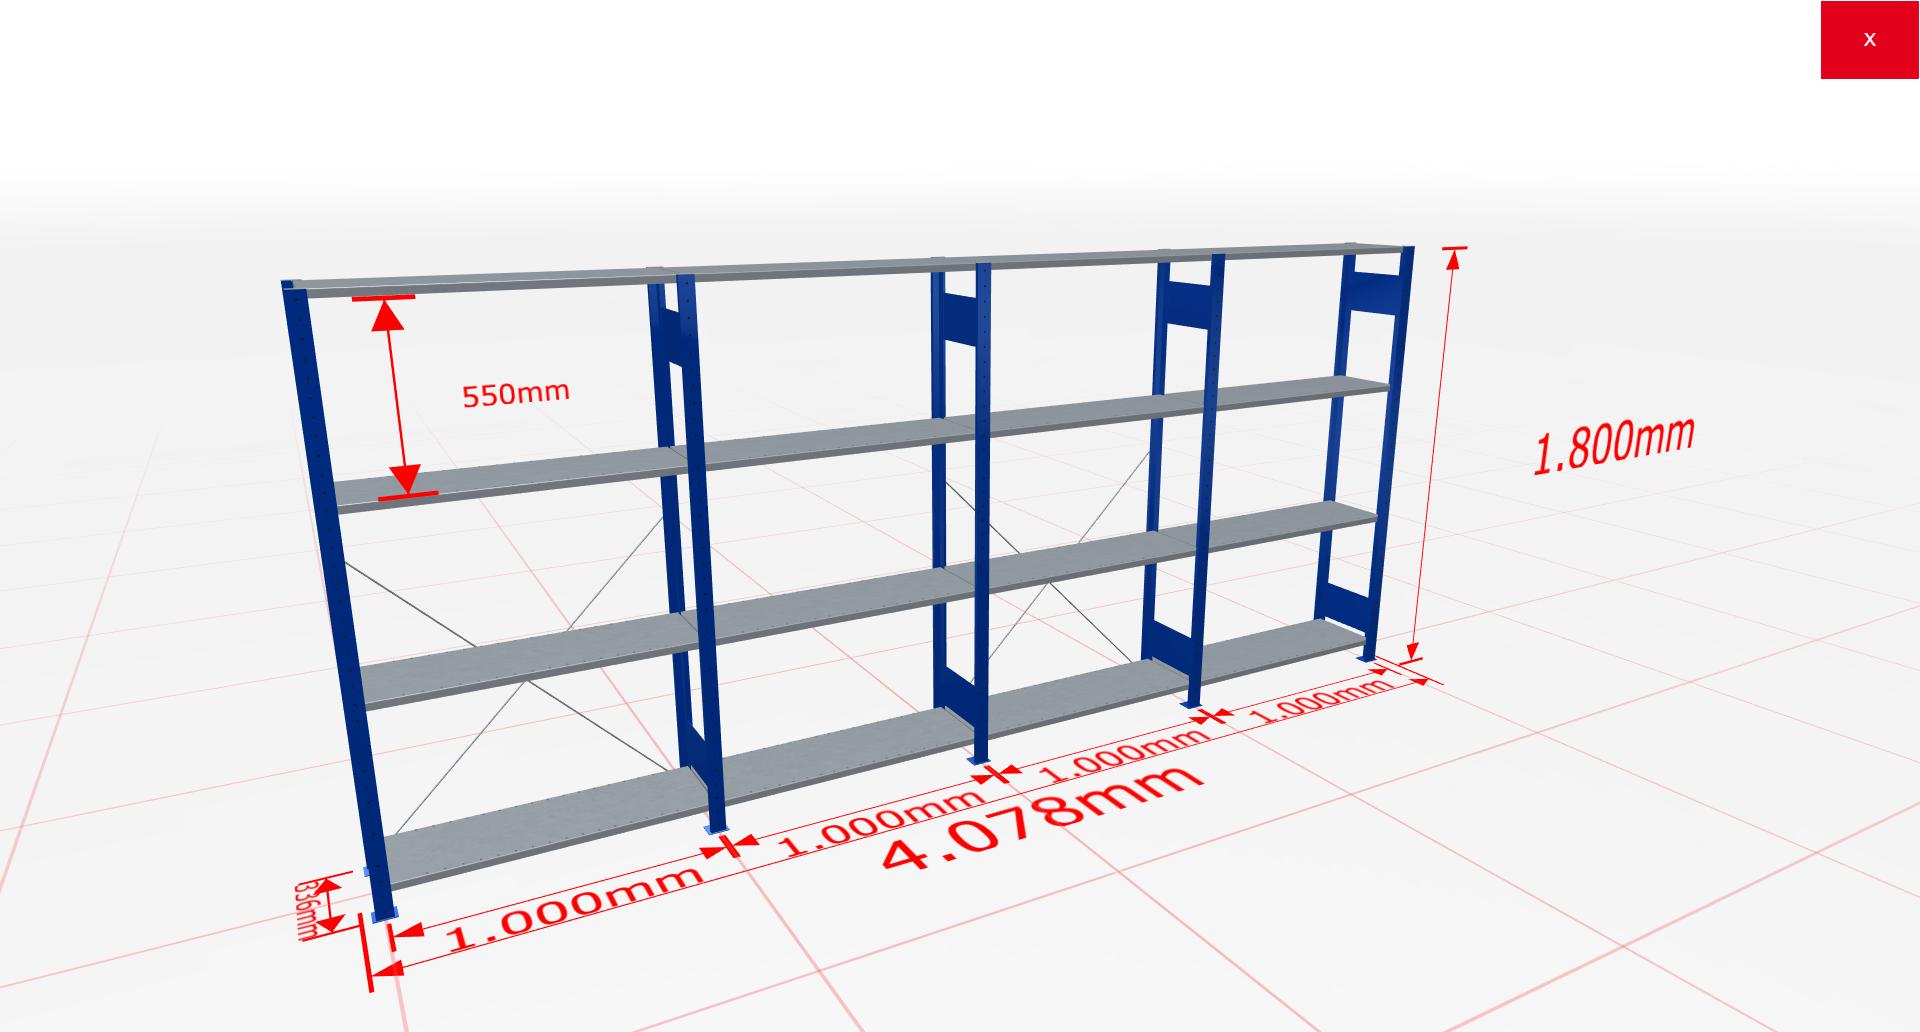 Fachbodenregal Komplettregal 1800x4078x300 mm (HxBxT) SCHULTE Lagertechnik blau 4 Ebenen  150 kg je Boden